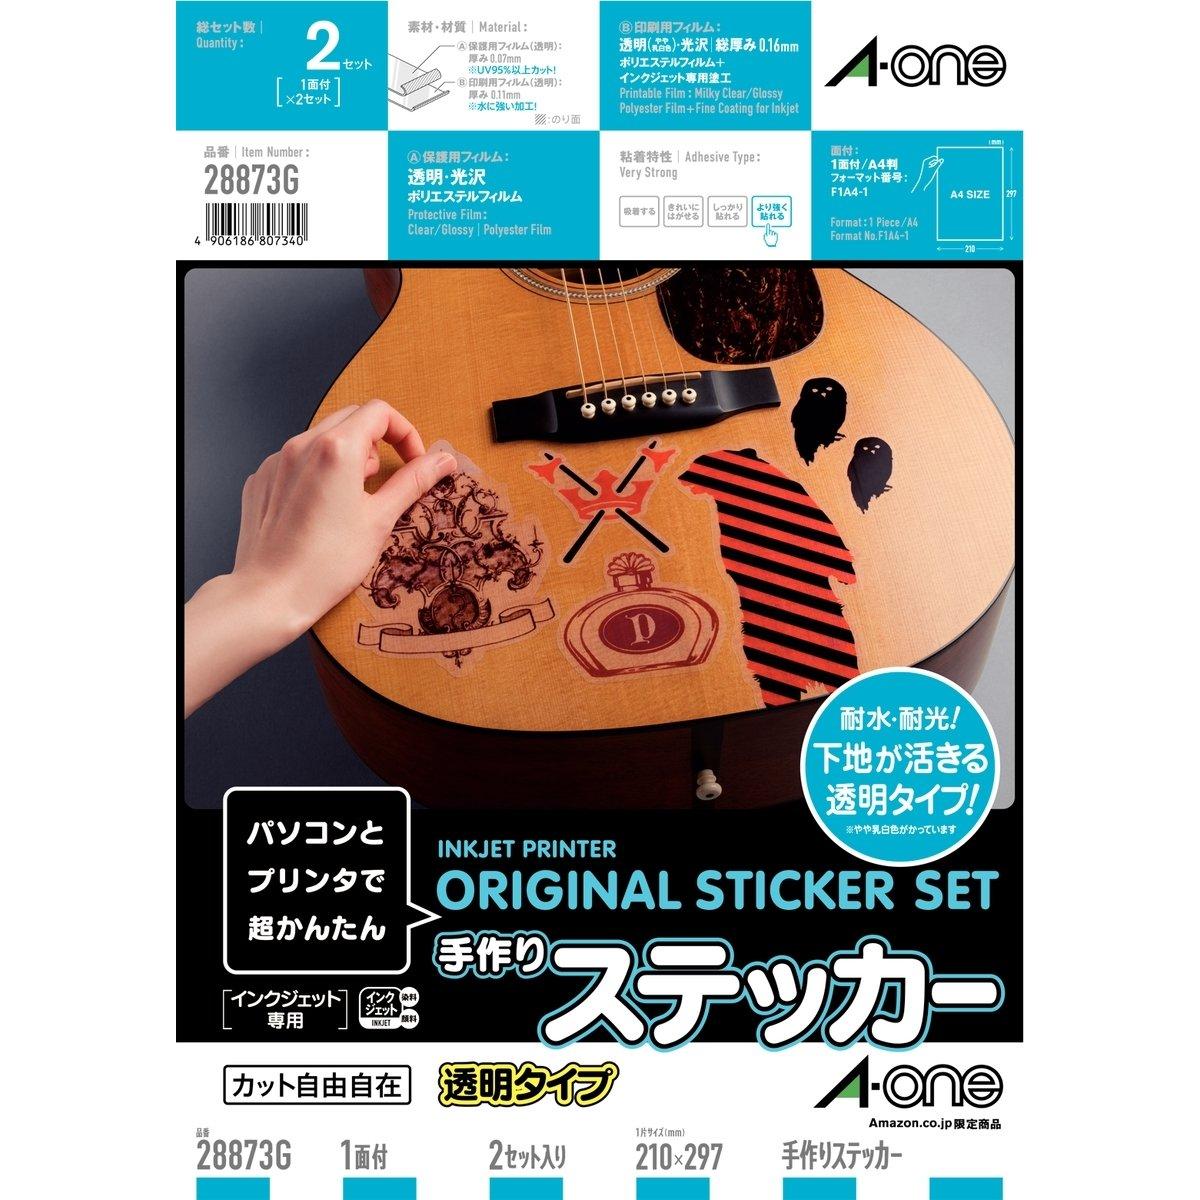 【Amazon.co.jp限定】 エーワン 手作りステッカー 透明 28873 2枚パック